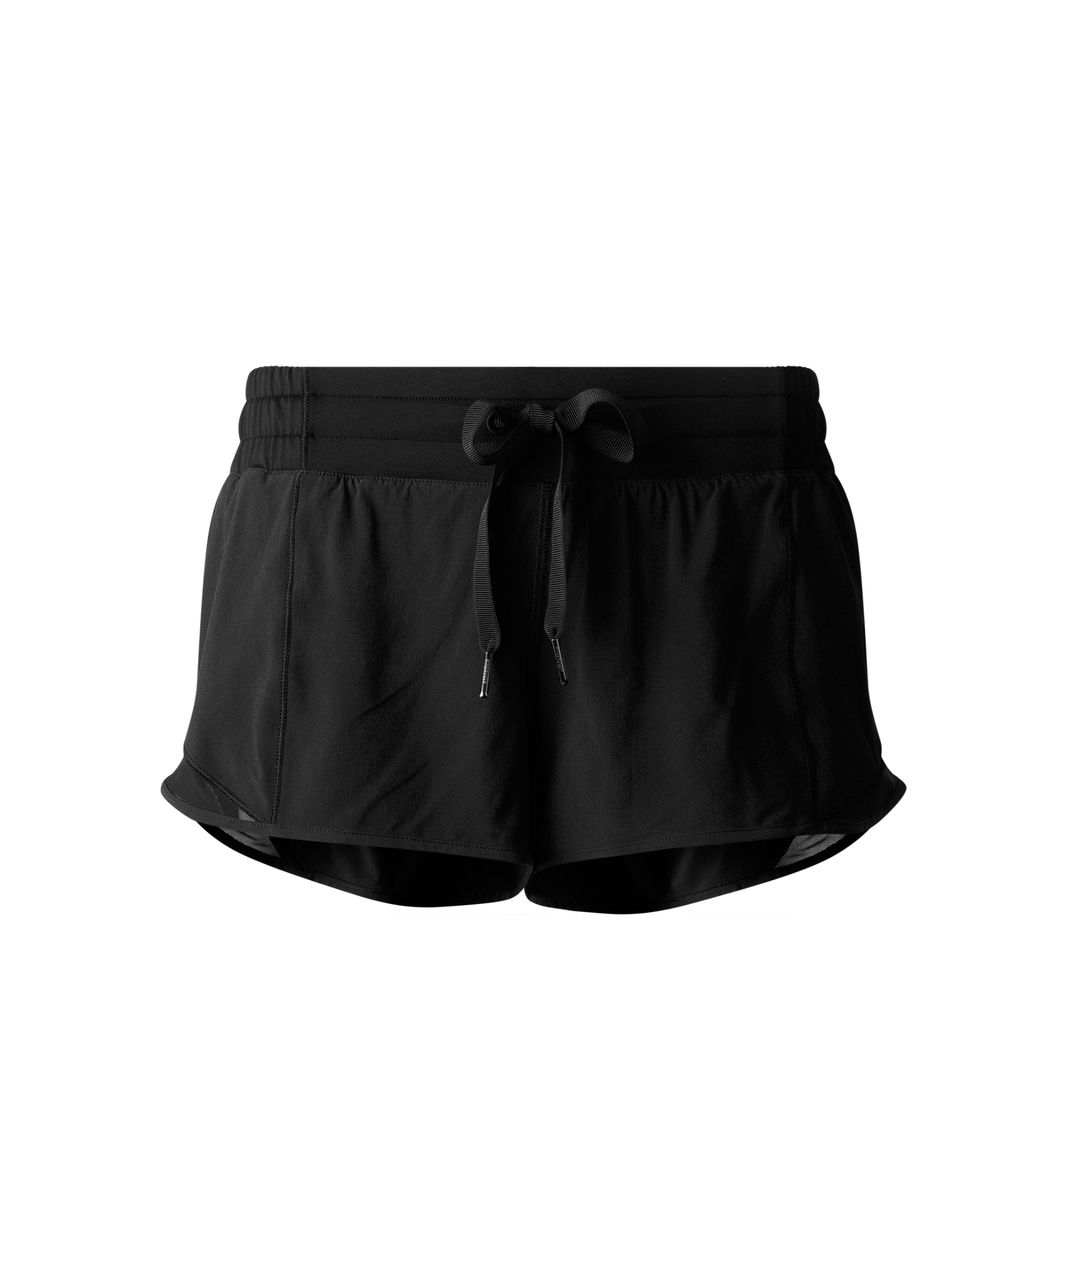 Lululemon Hotty Hot Short - Black (First Release)